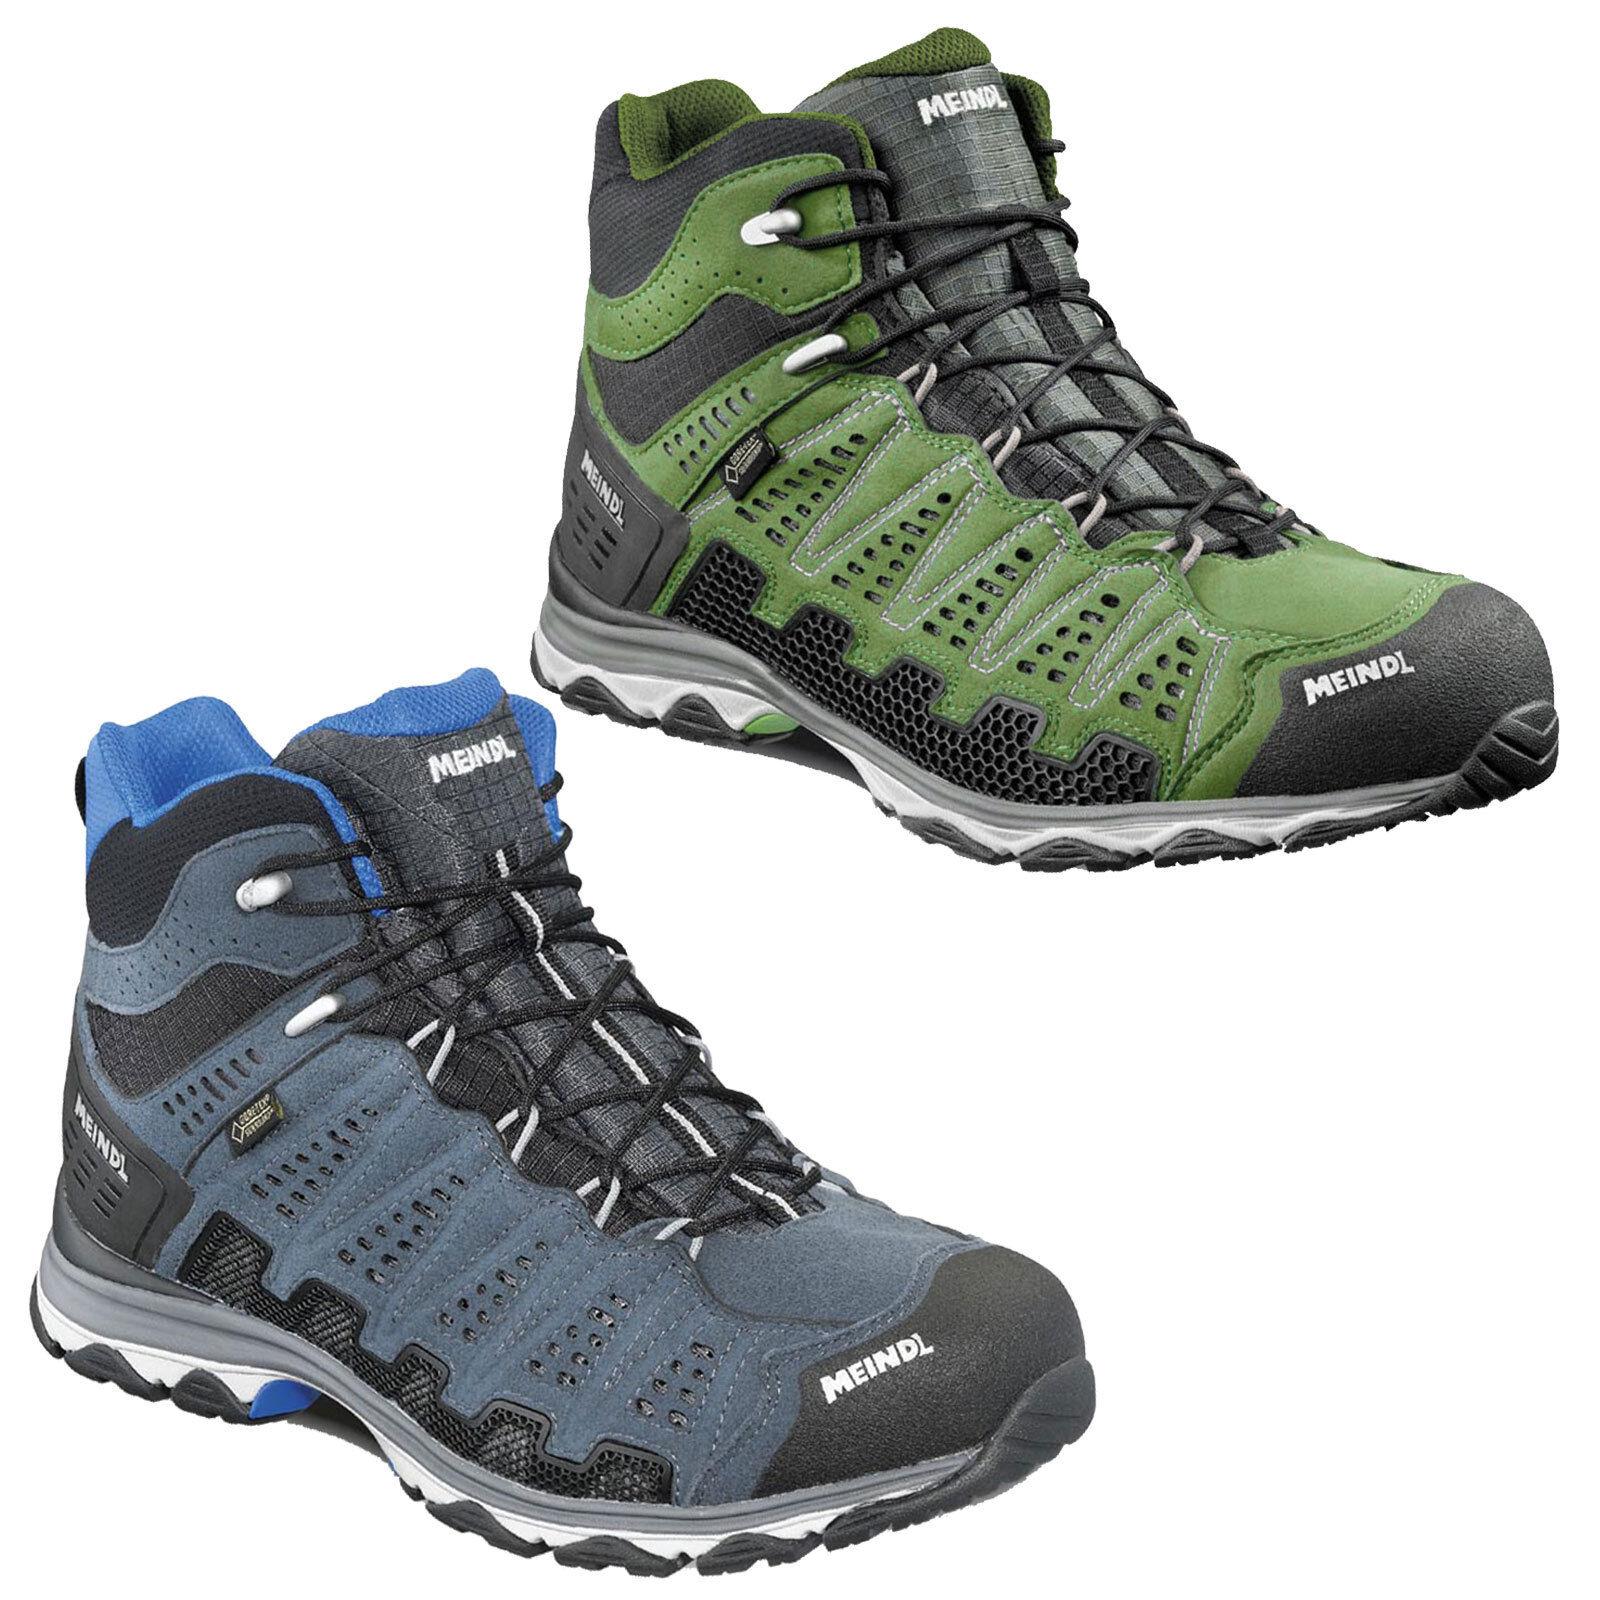 Meindl X-So GTX Goretex Zapatos de Senderismo botas Hombres Actividades Al Aire